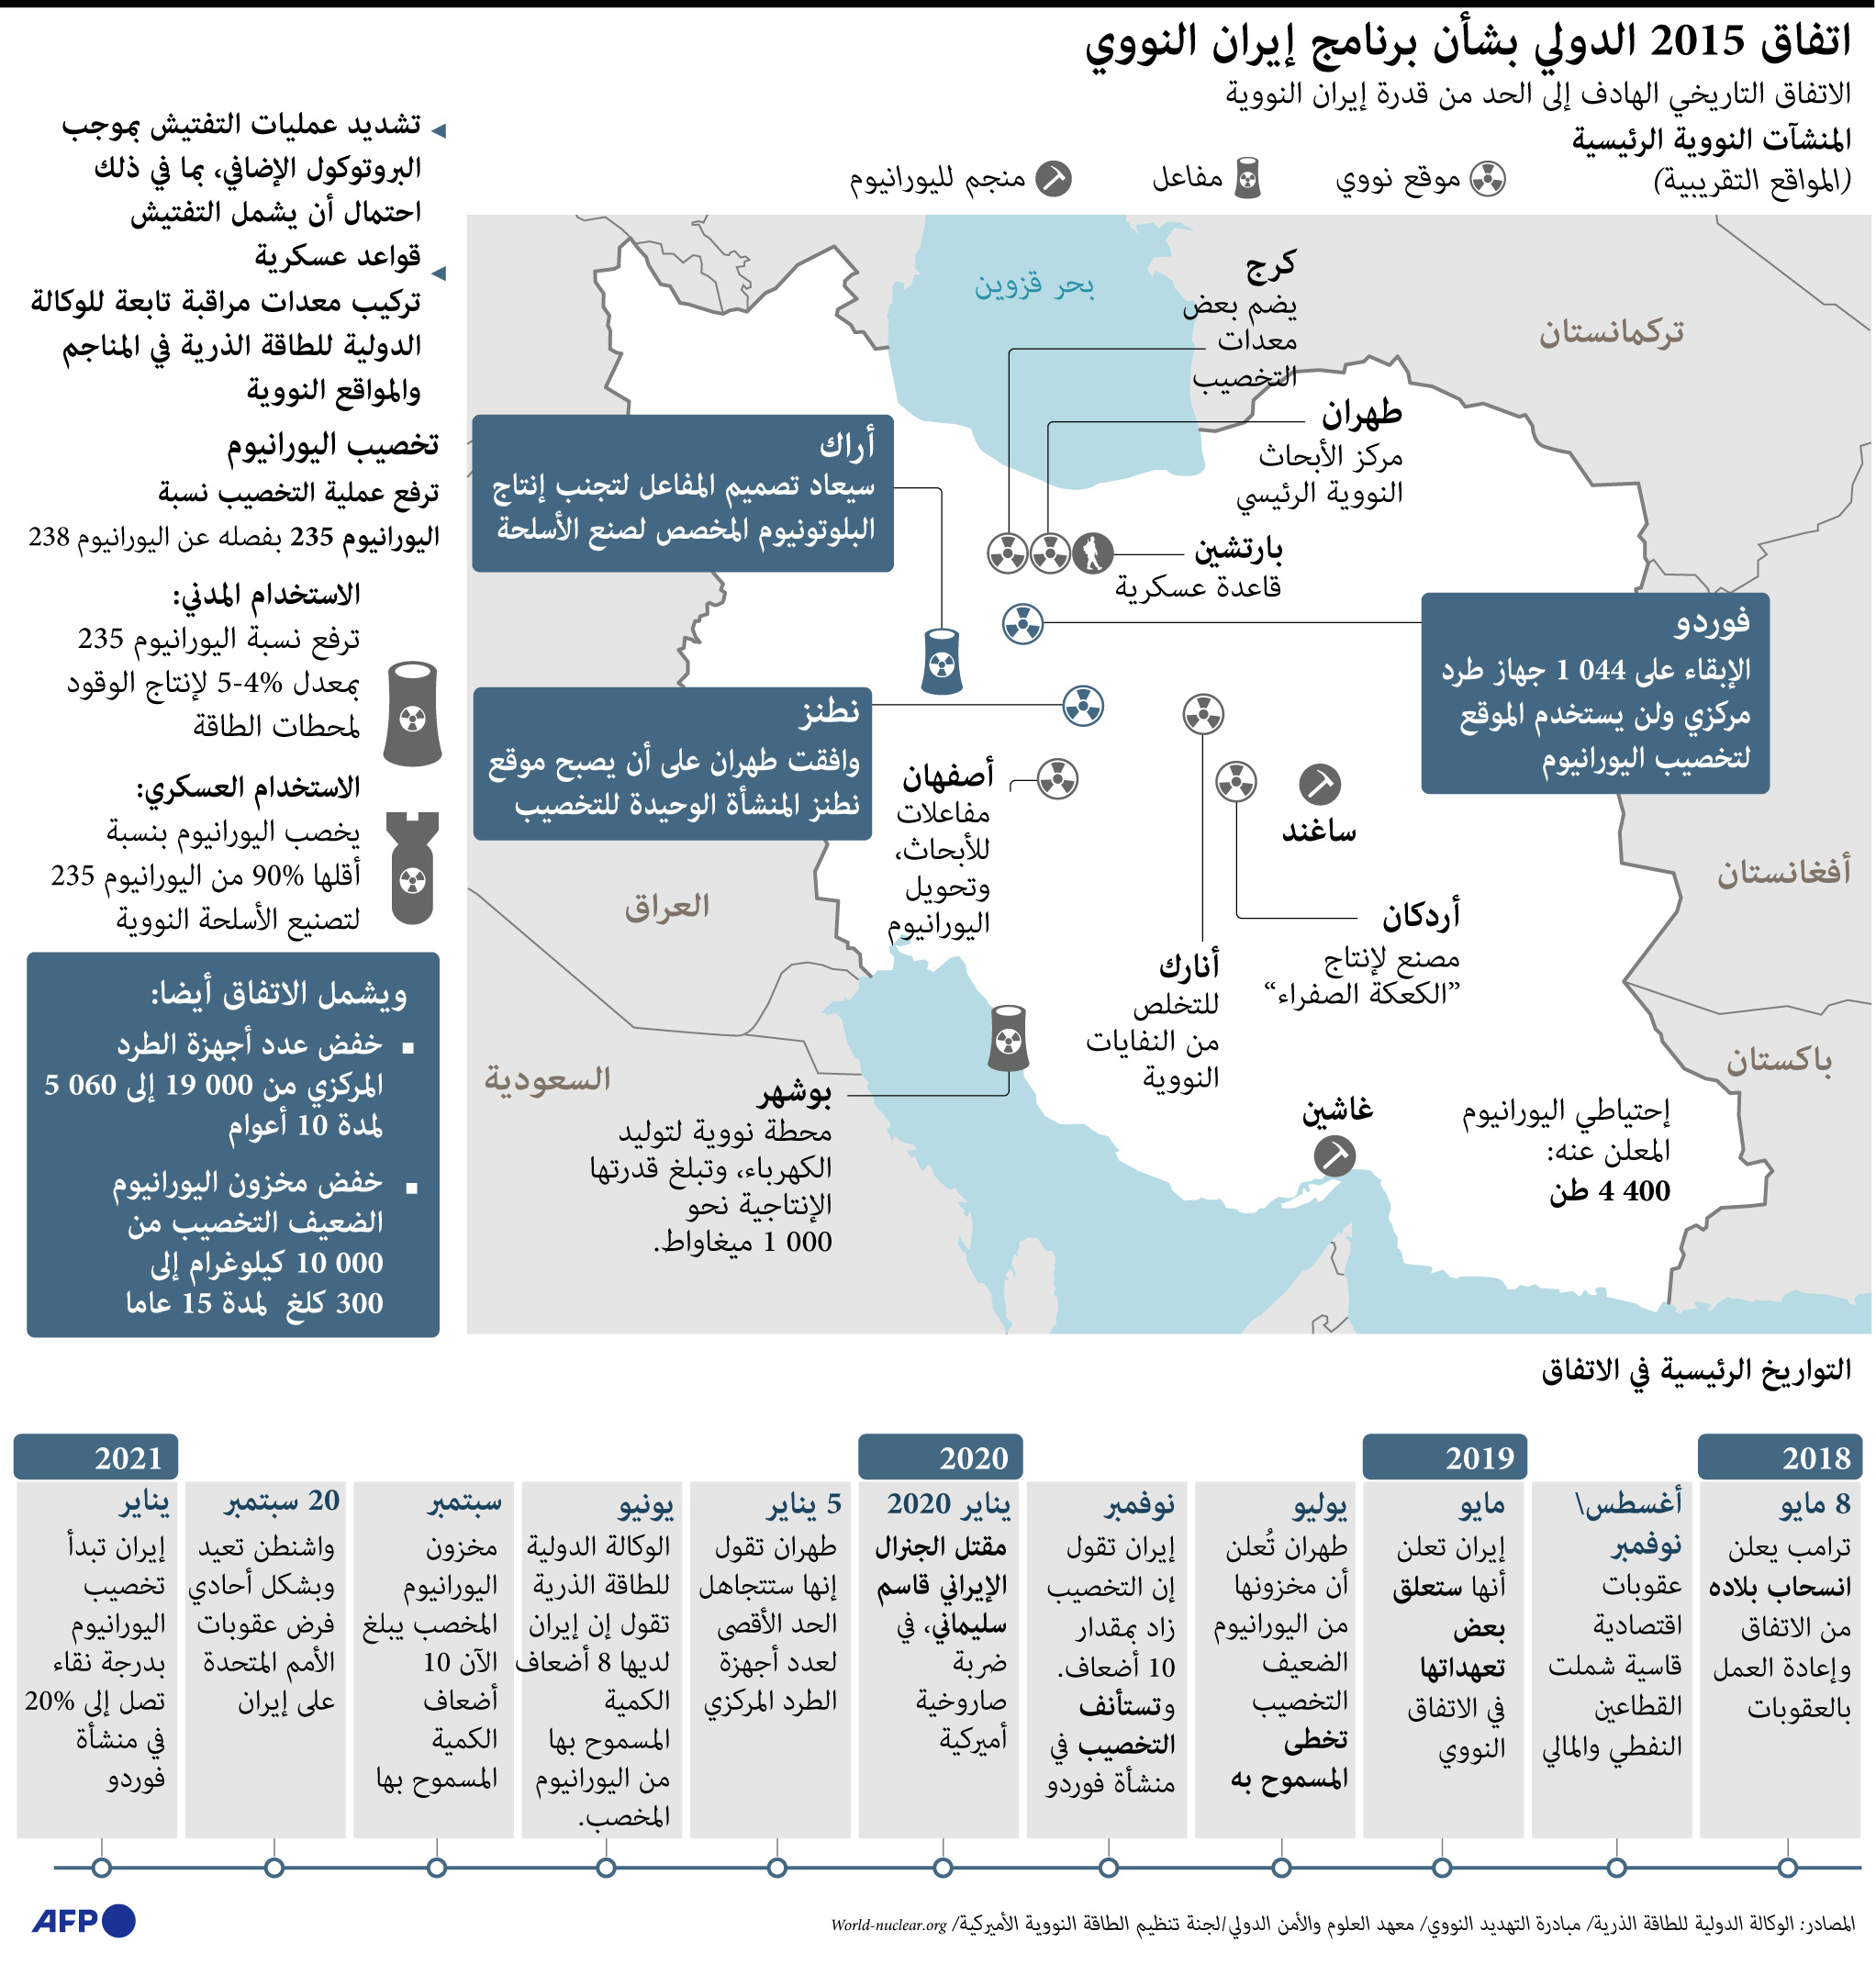 اتفاق 2015 بشأن برنامج إيران النووي